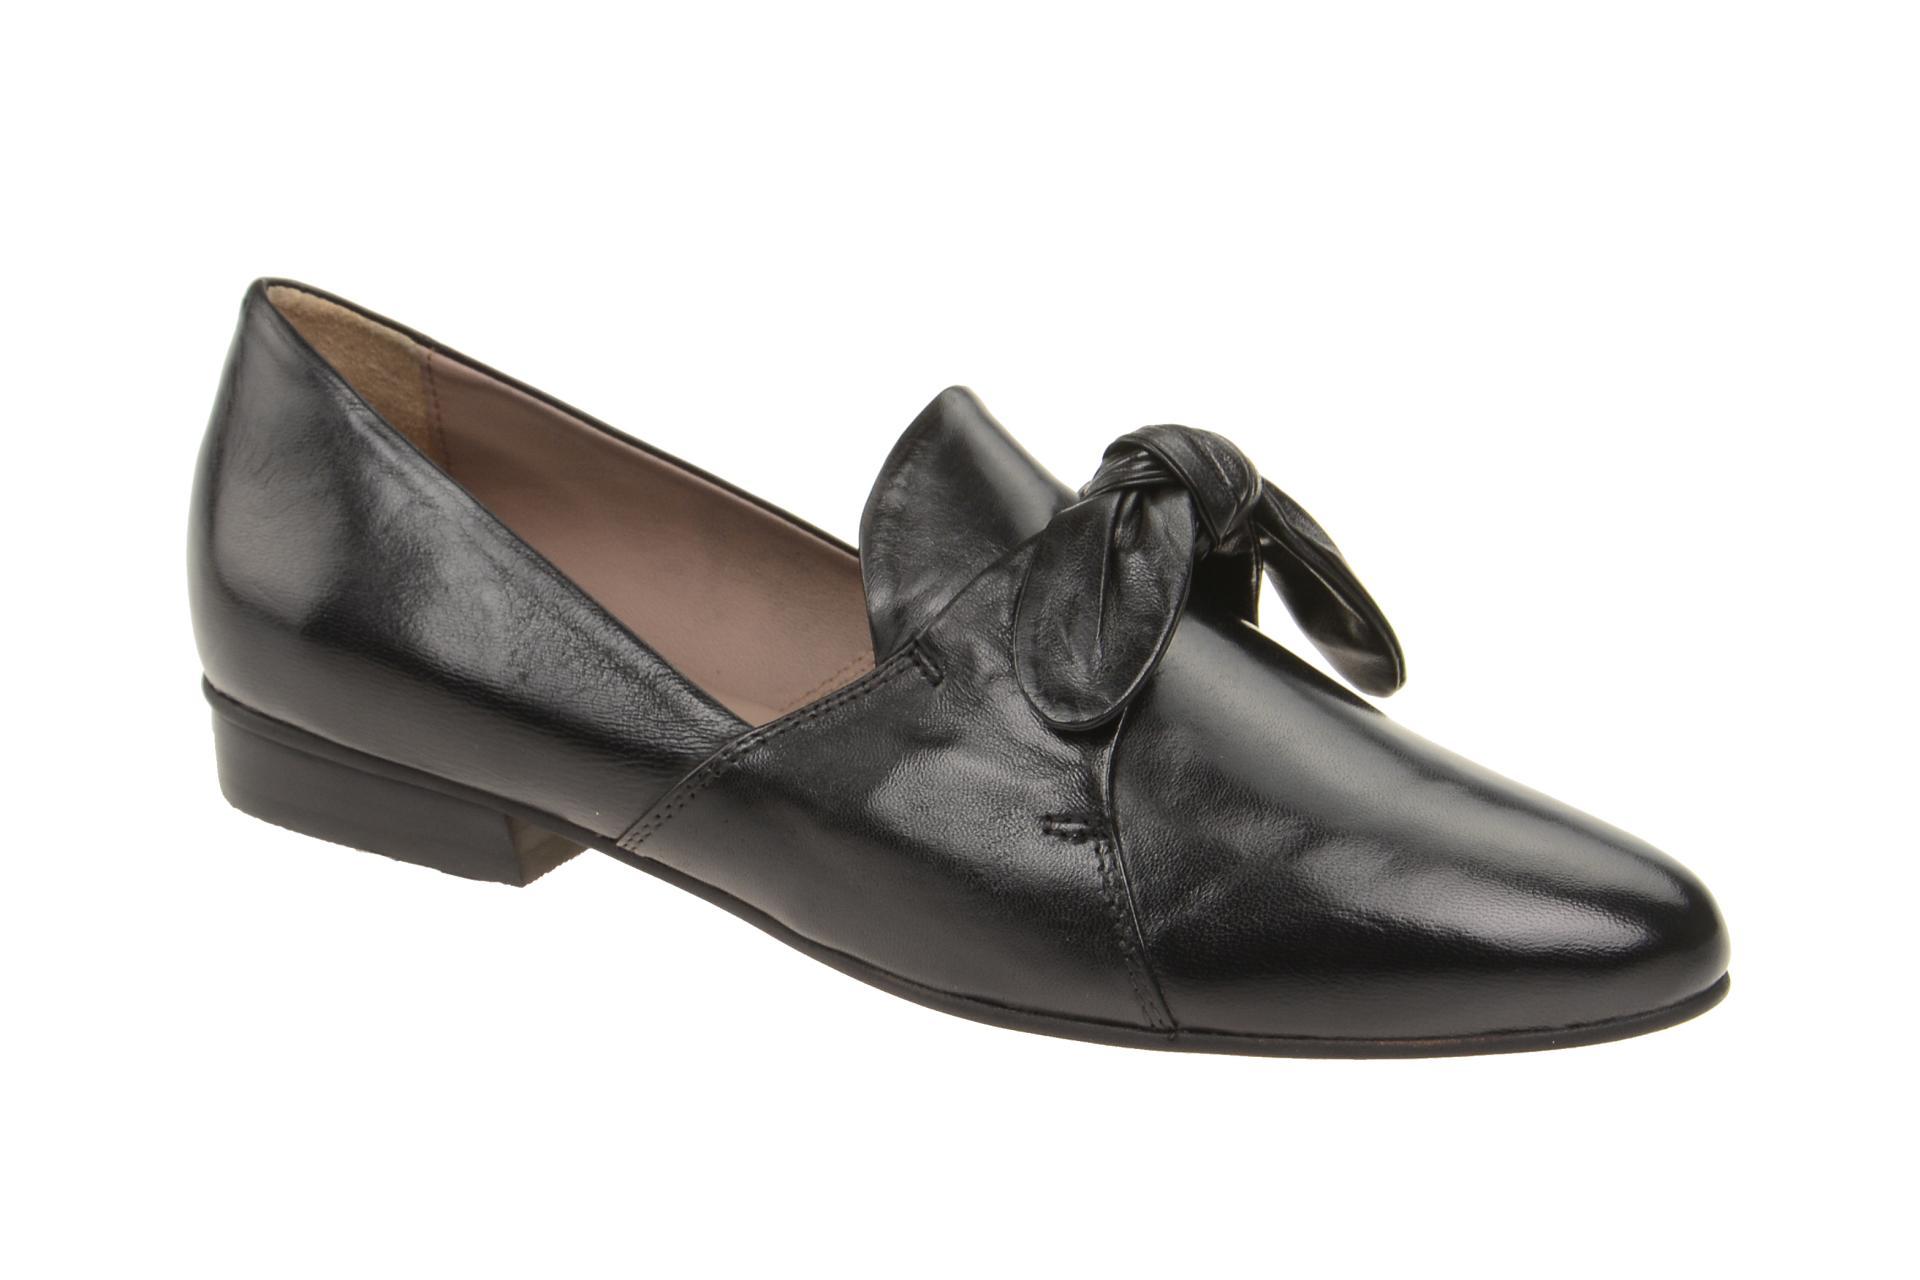 sale retailer 36e3d 06731 Details zu Everybody Schuhe 30589 schwarz Damenschuhe elegante Slipper  30589P2399 nero NEU